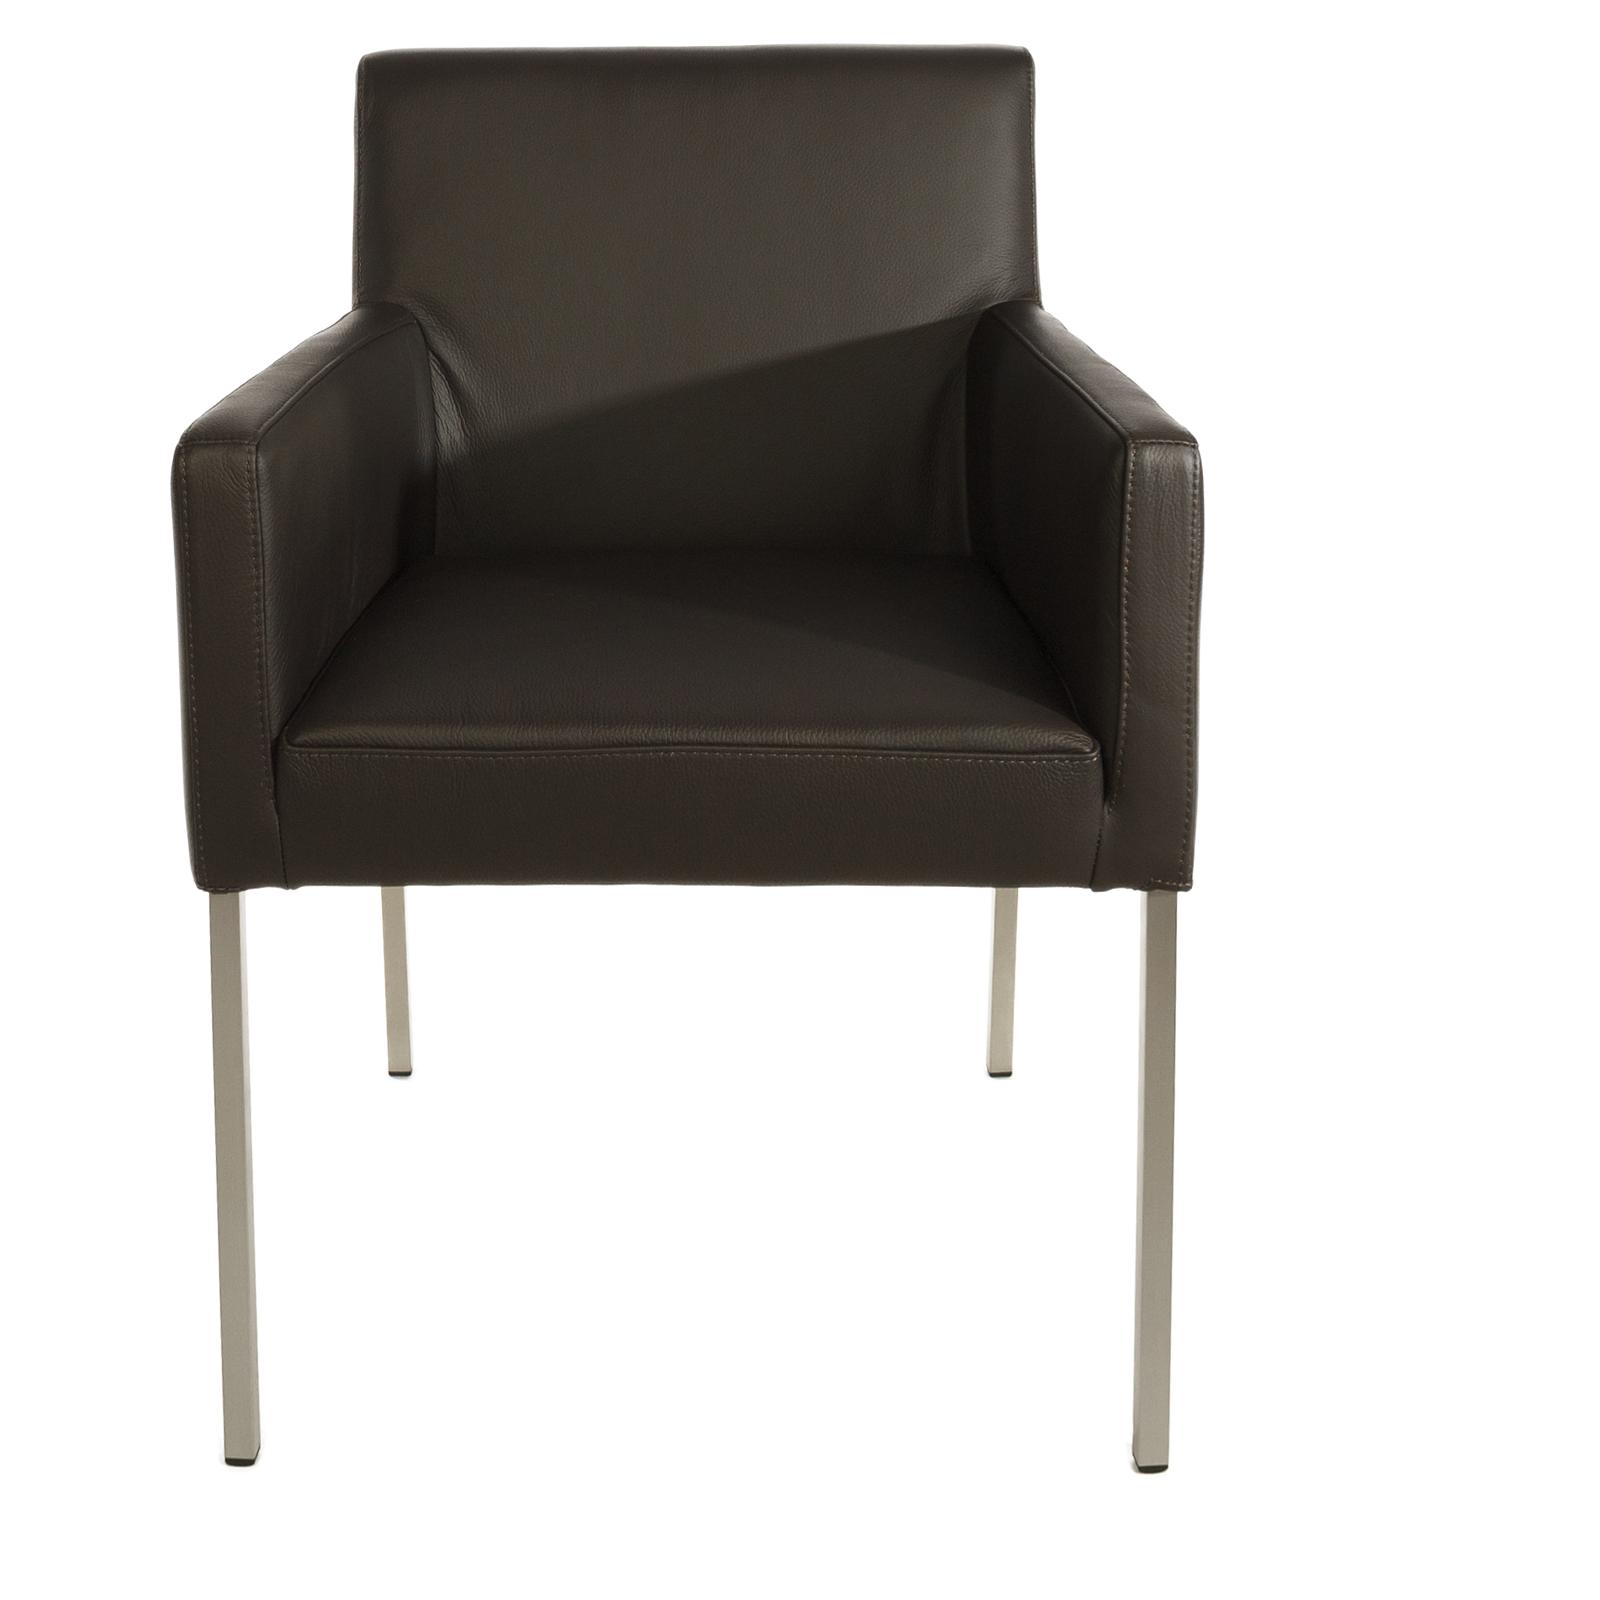 armlehnstuhl ledersessel nois braun. Black Bedroom Furniture Sets. Home Design Ideas